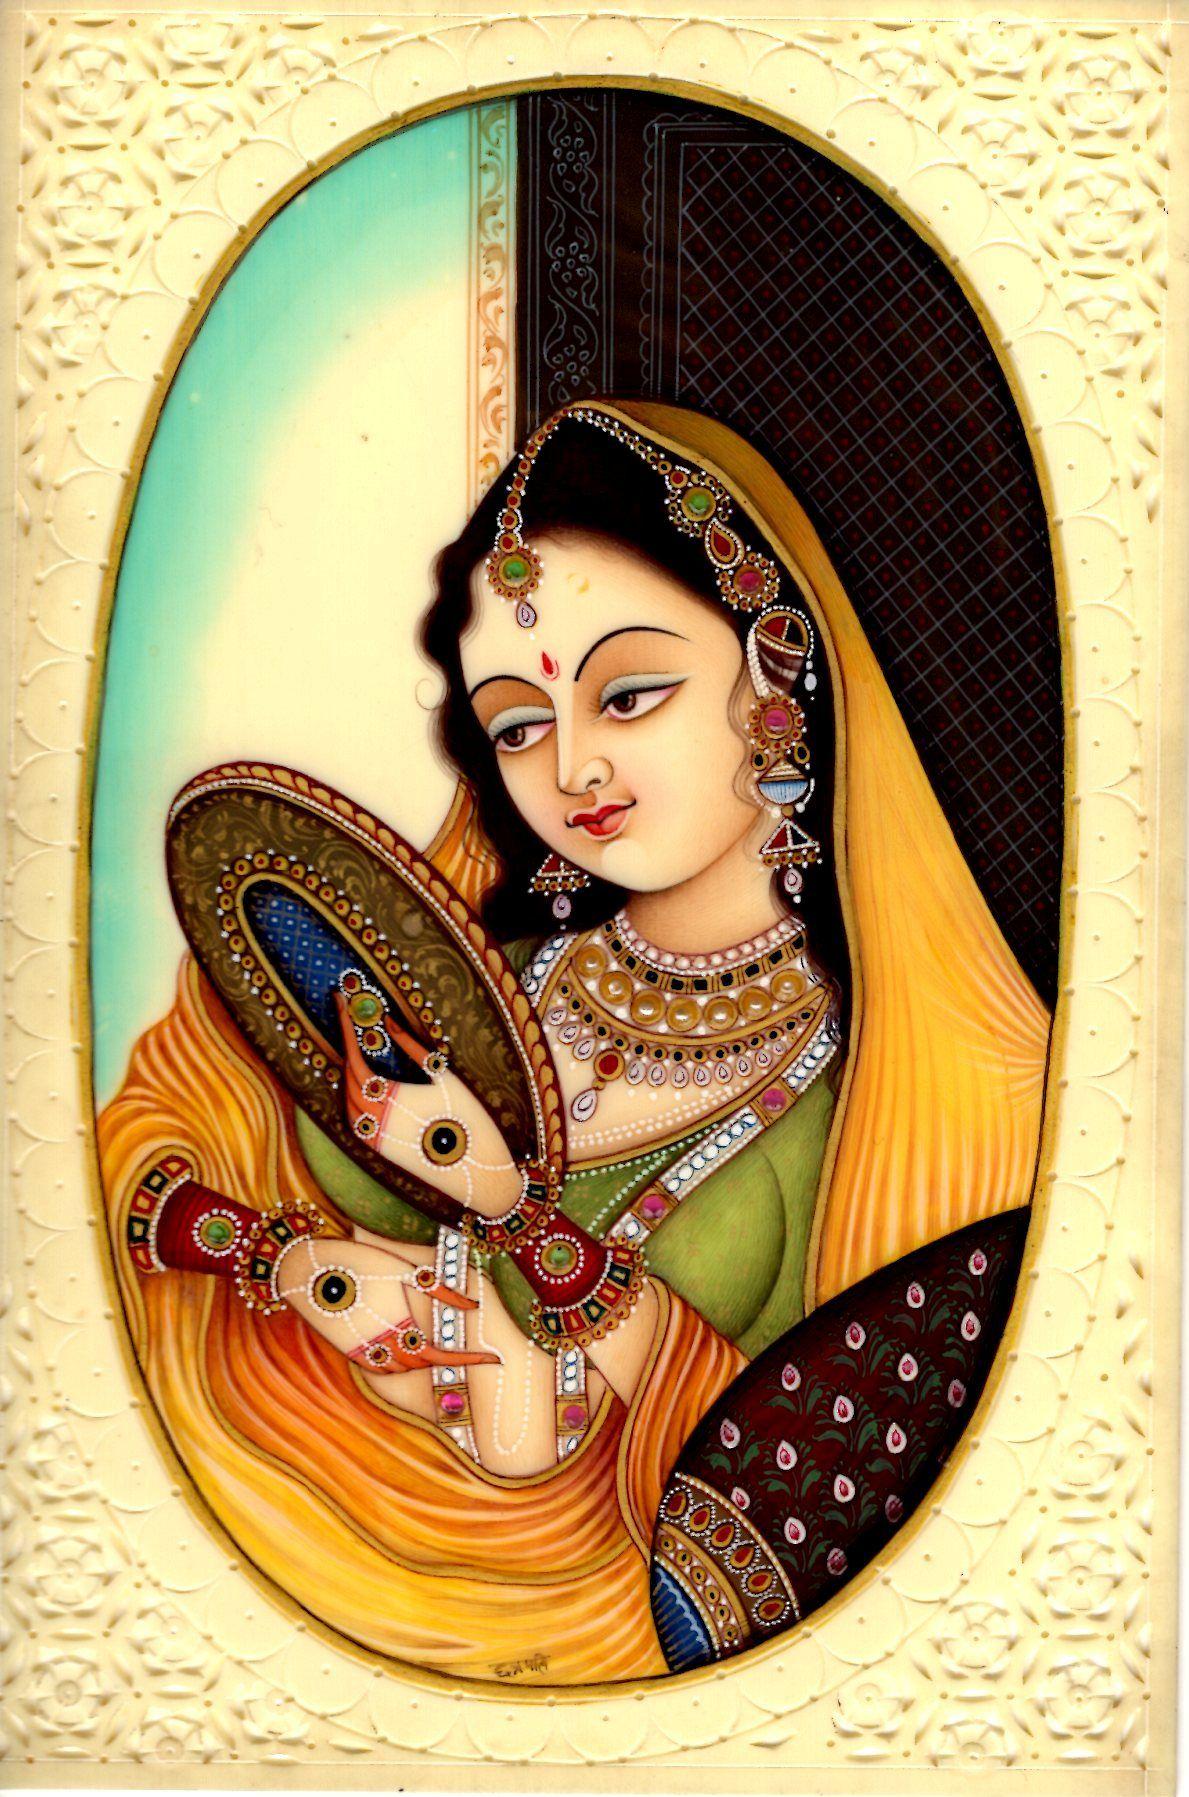 Indian Miniature Painting Mughal Princess Handmade -3981